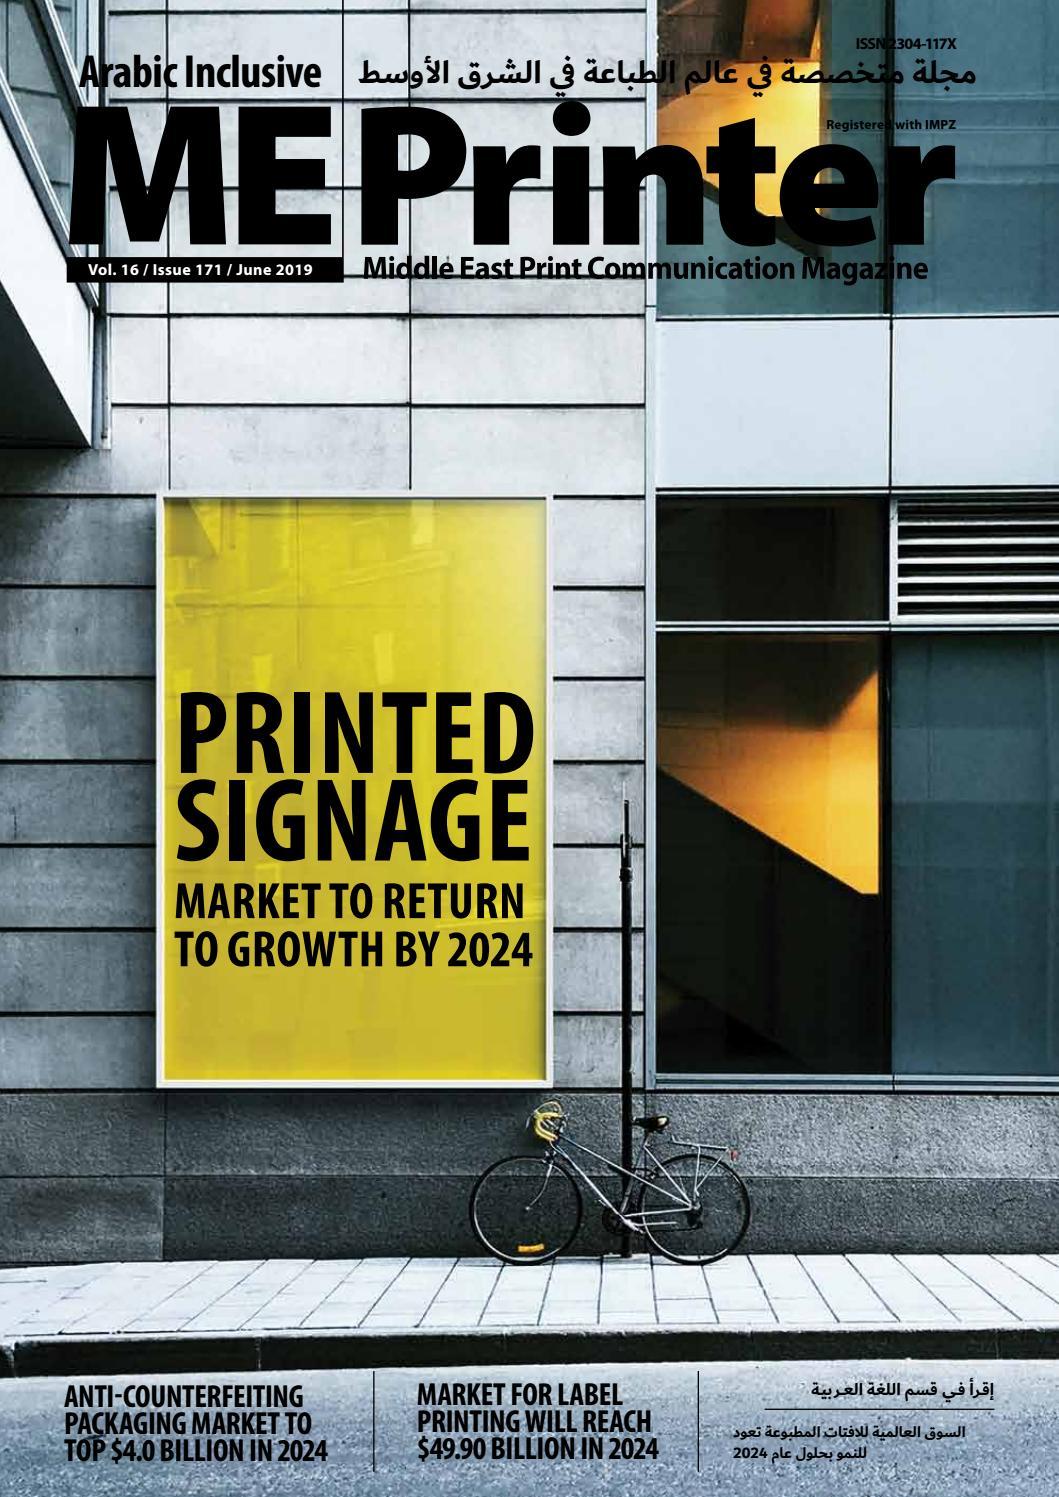 b30108d35 ME Printer June 2019 Issue 171 by ME Printer Magazine - issuu